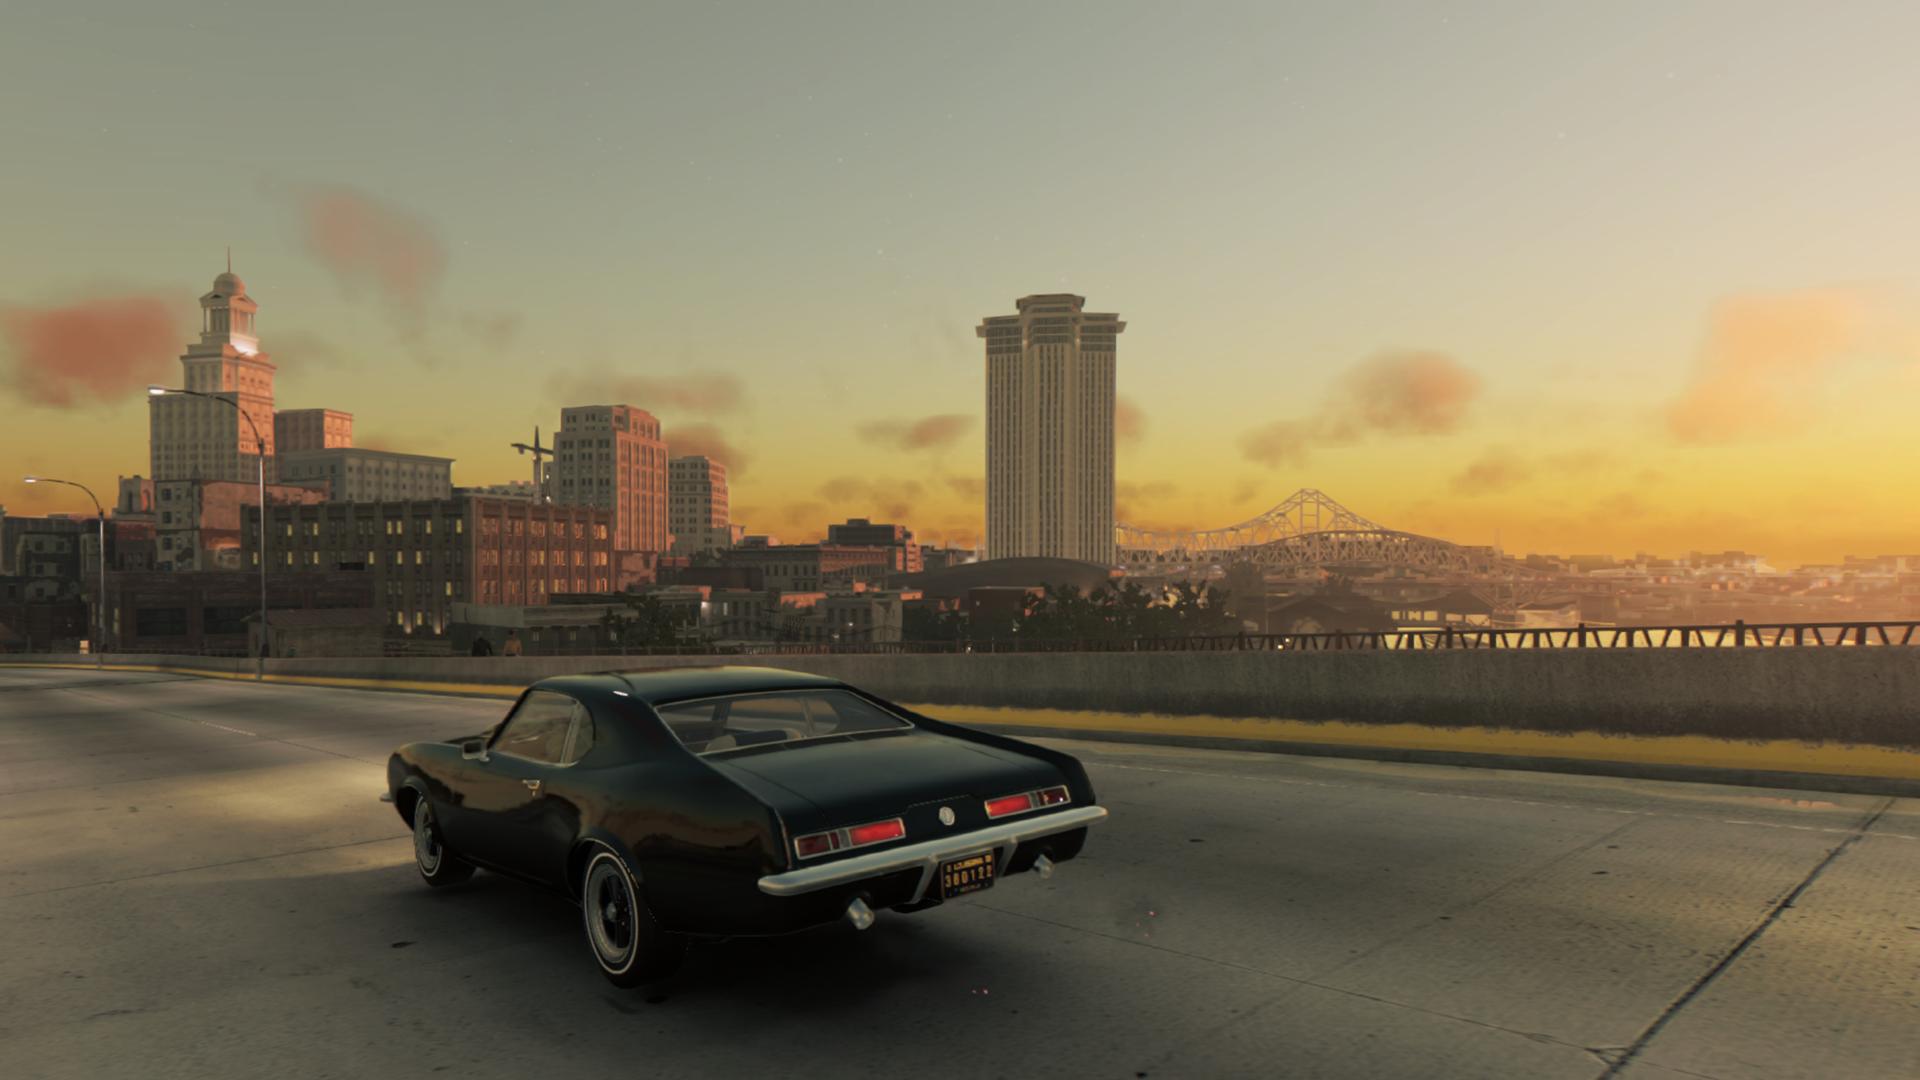 2K_MAFIA3_E3_CITY_DRIVE1.png